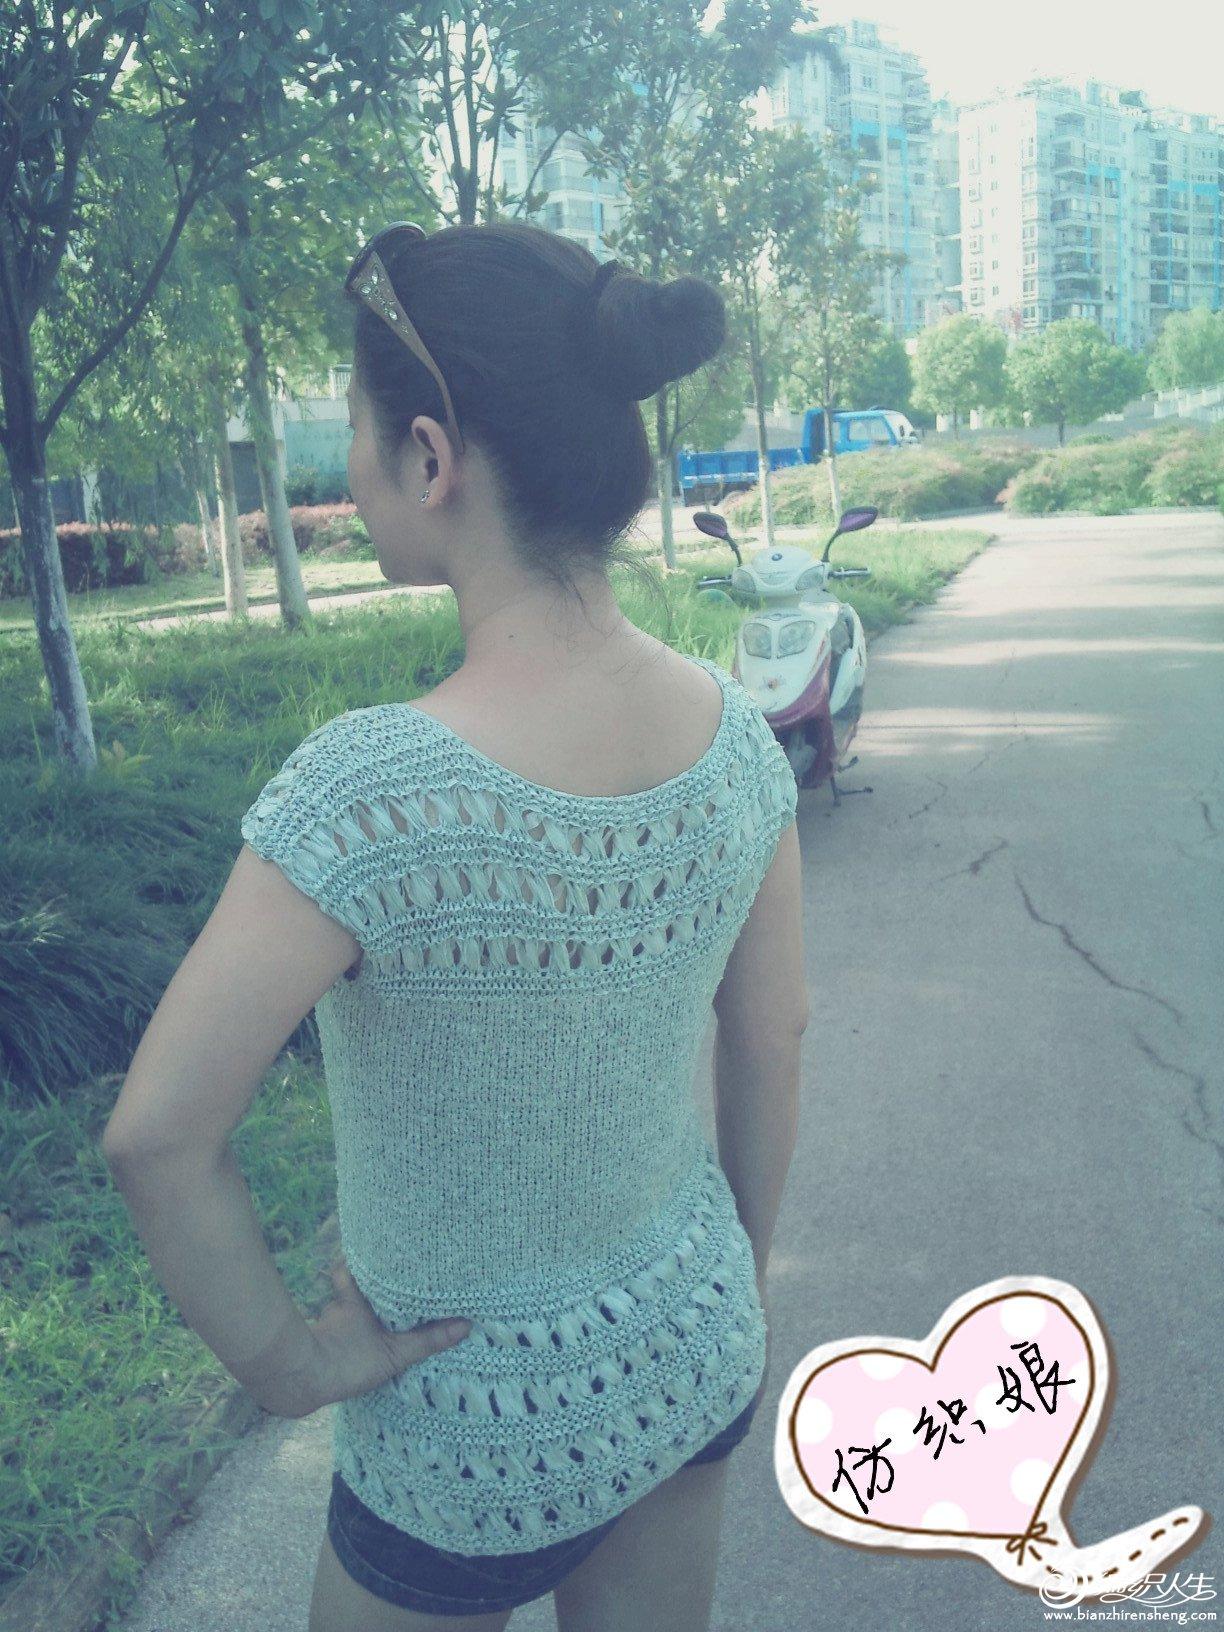 c360_2012-07-23 16-43-21_副本.jpg